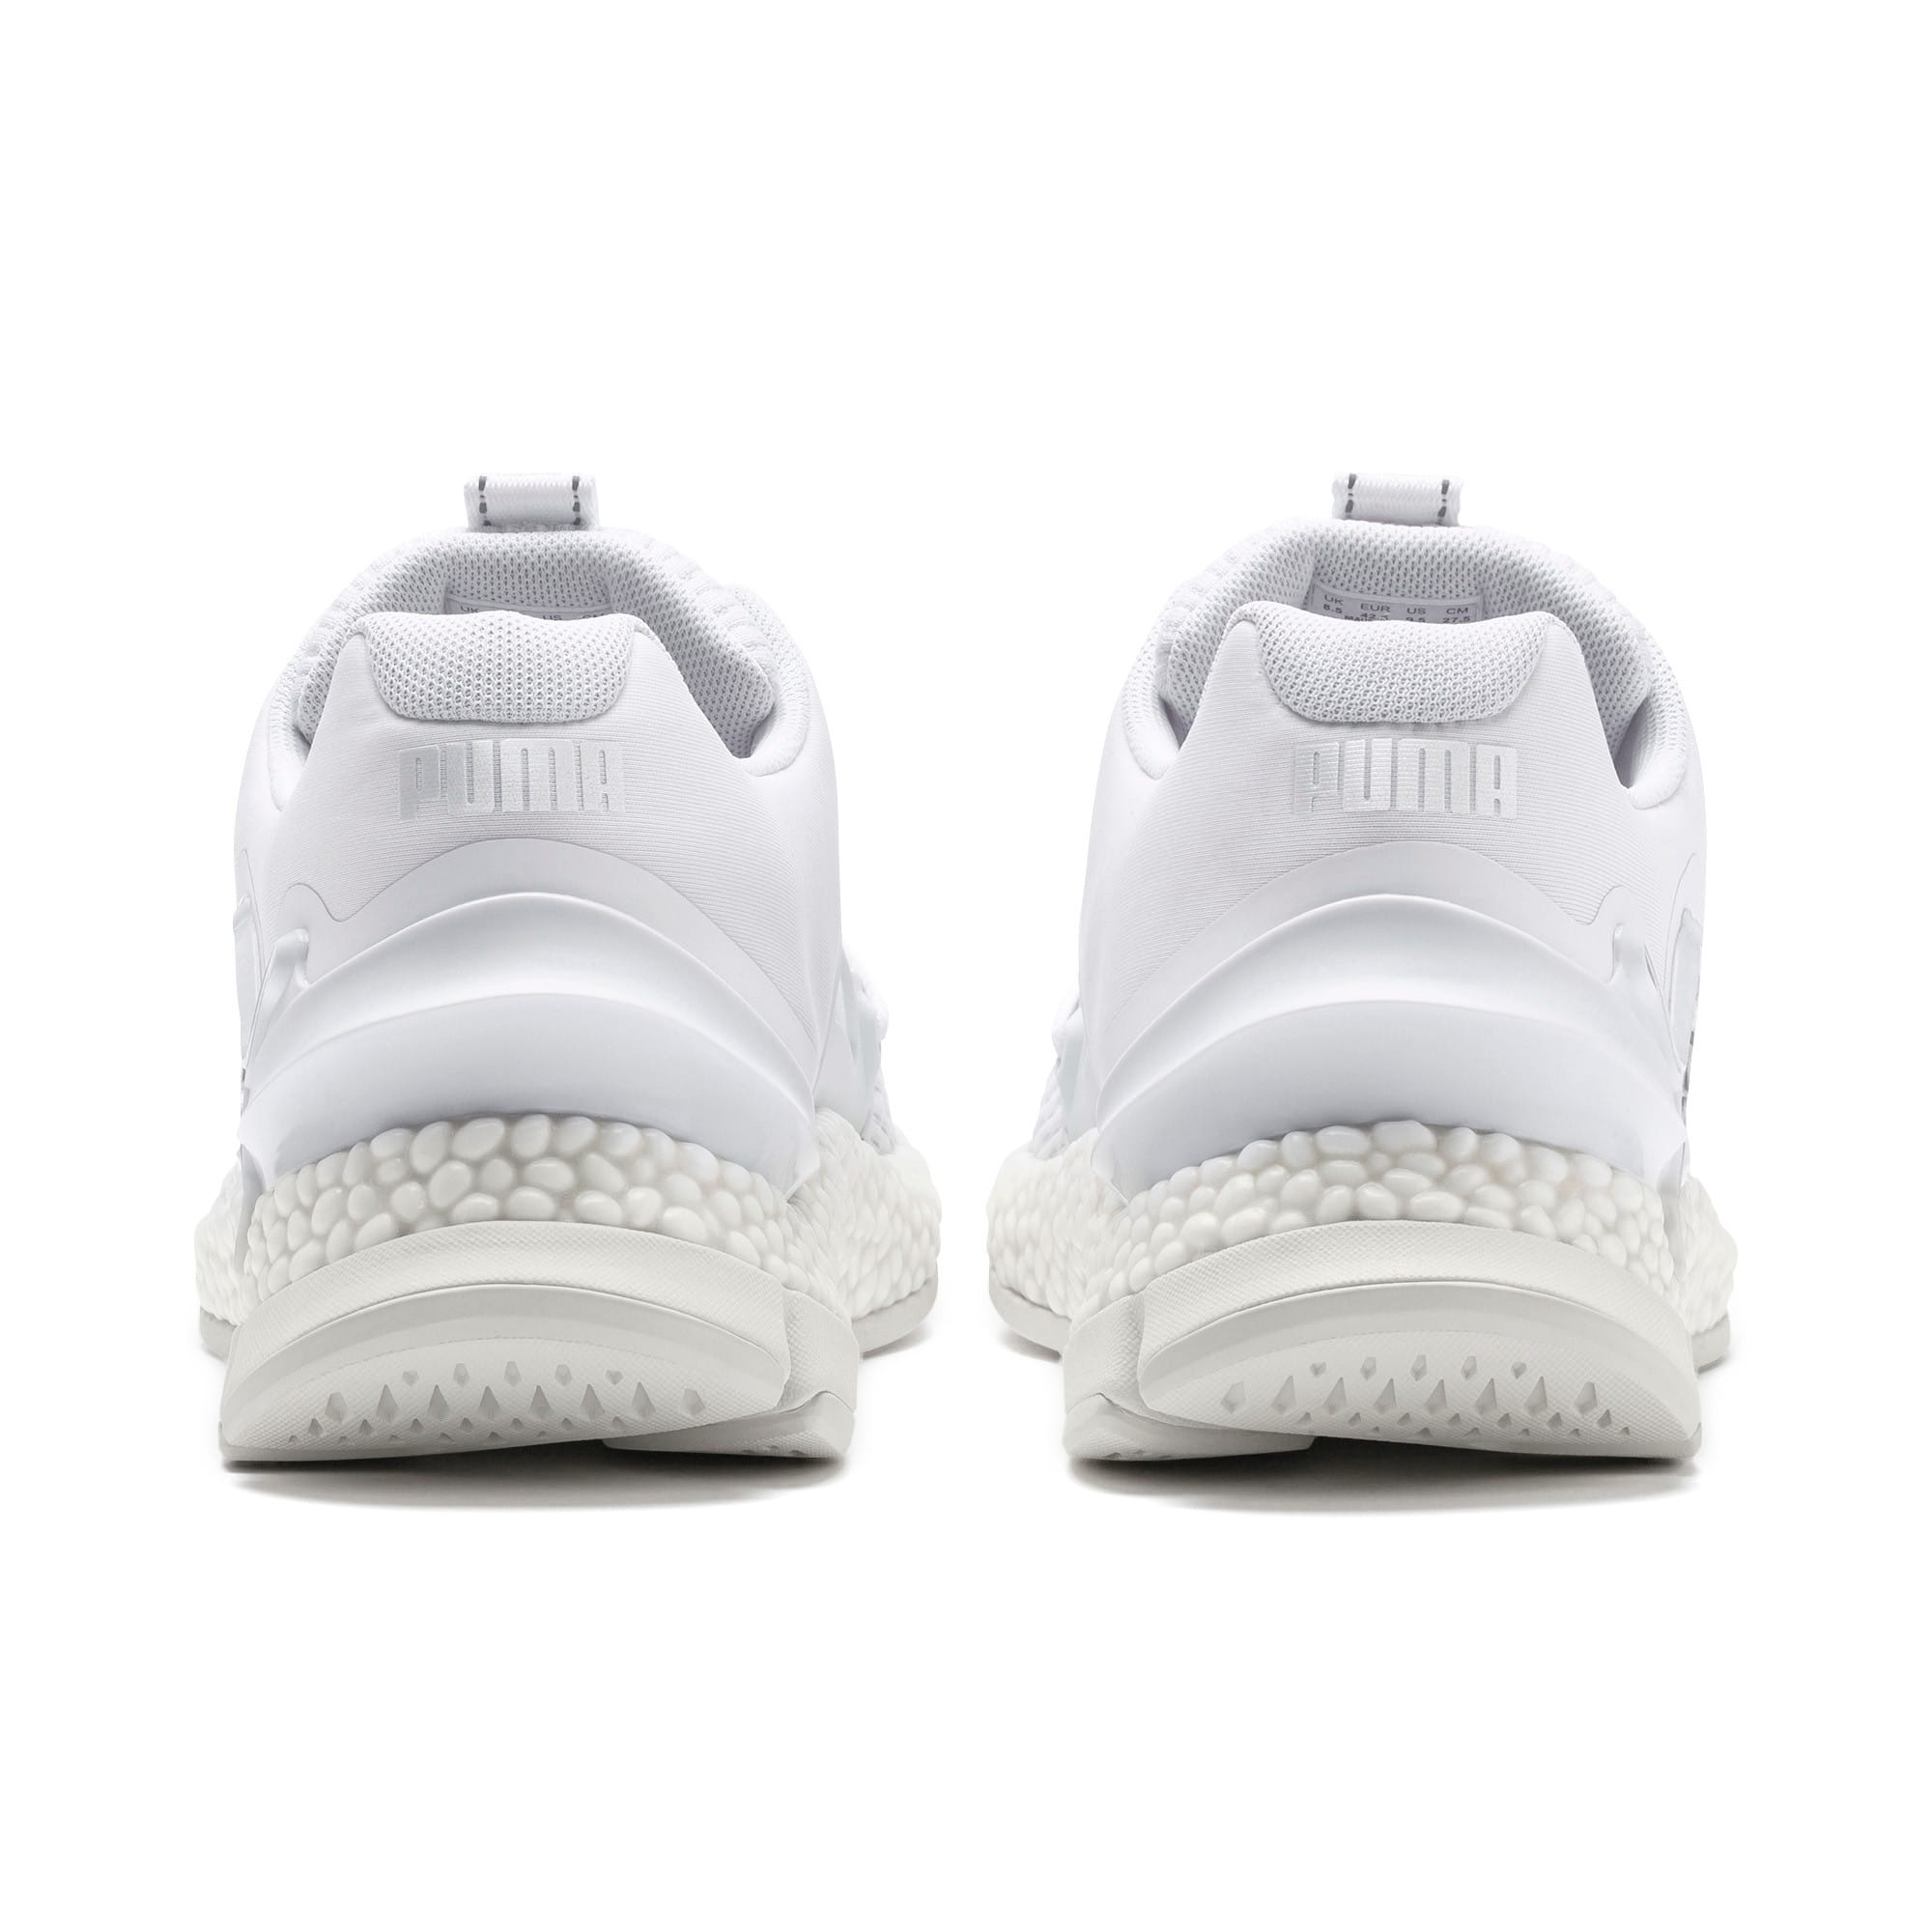 Thumbnail 4 of HYBRID Sky Lights Men's Running Shoes, Puma White-Puma Silver, medium